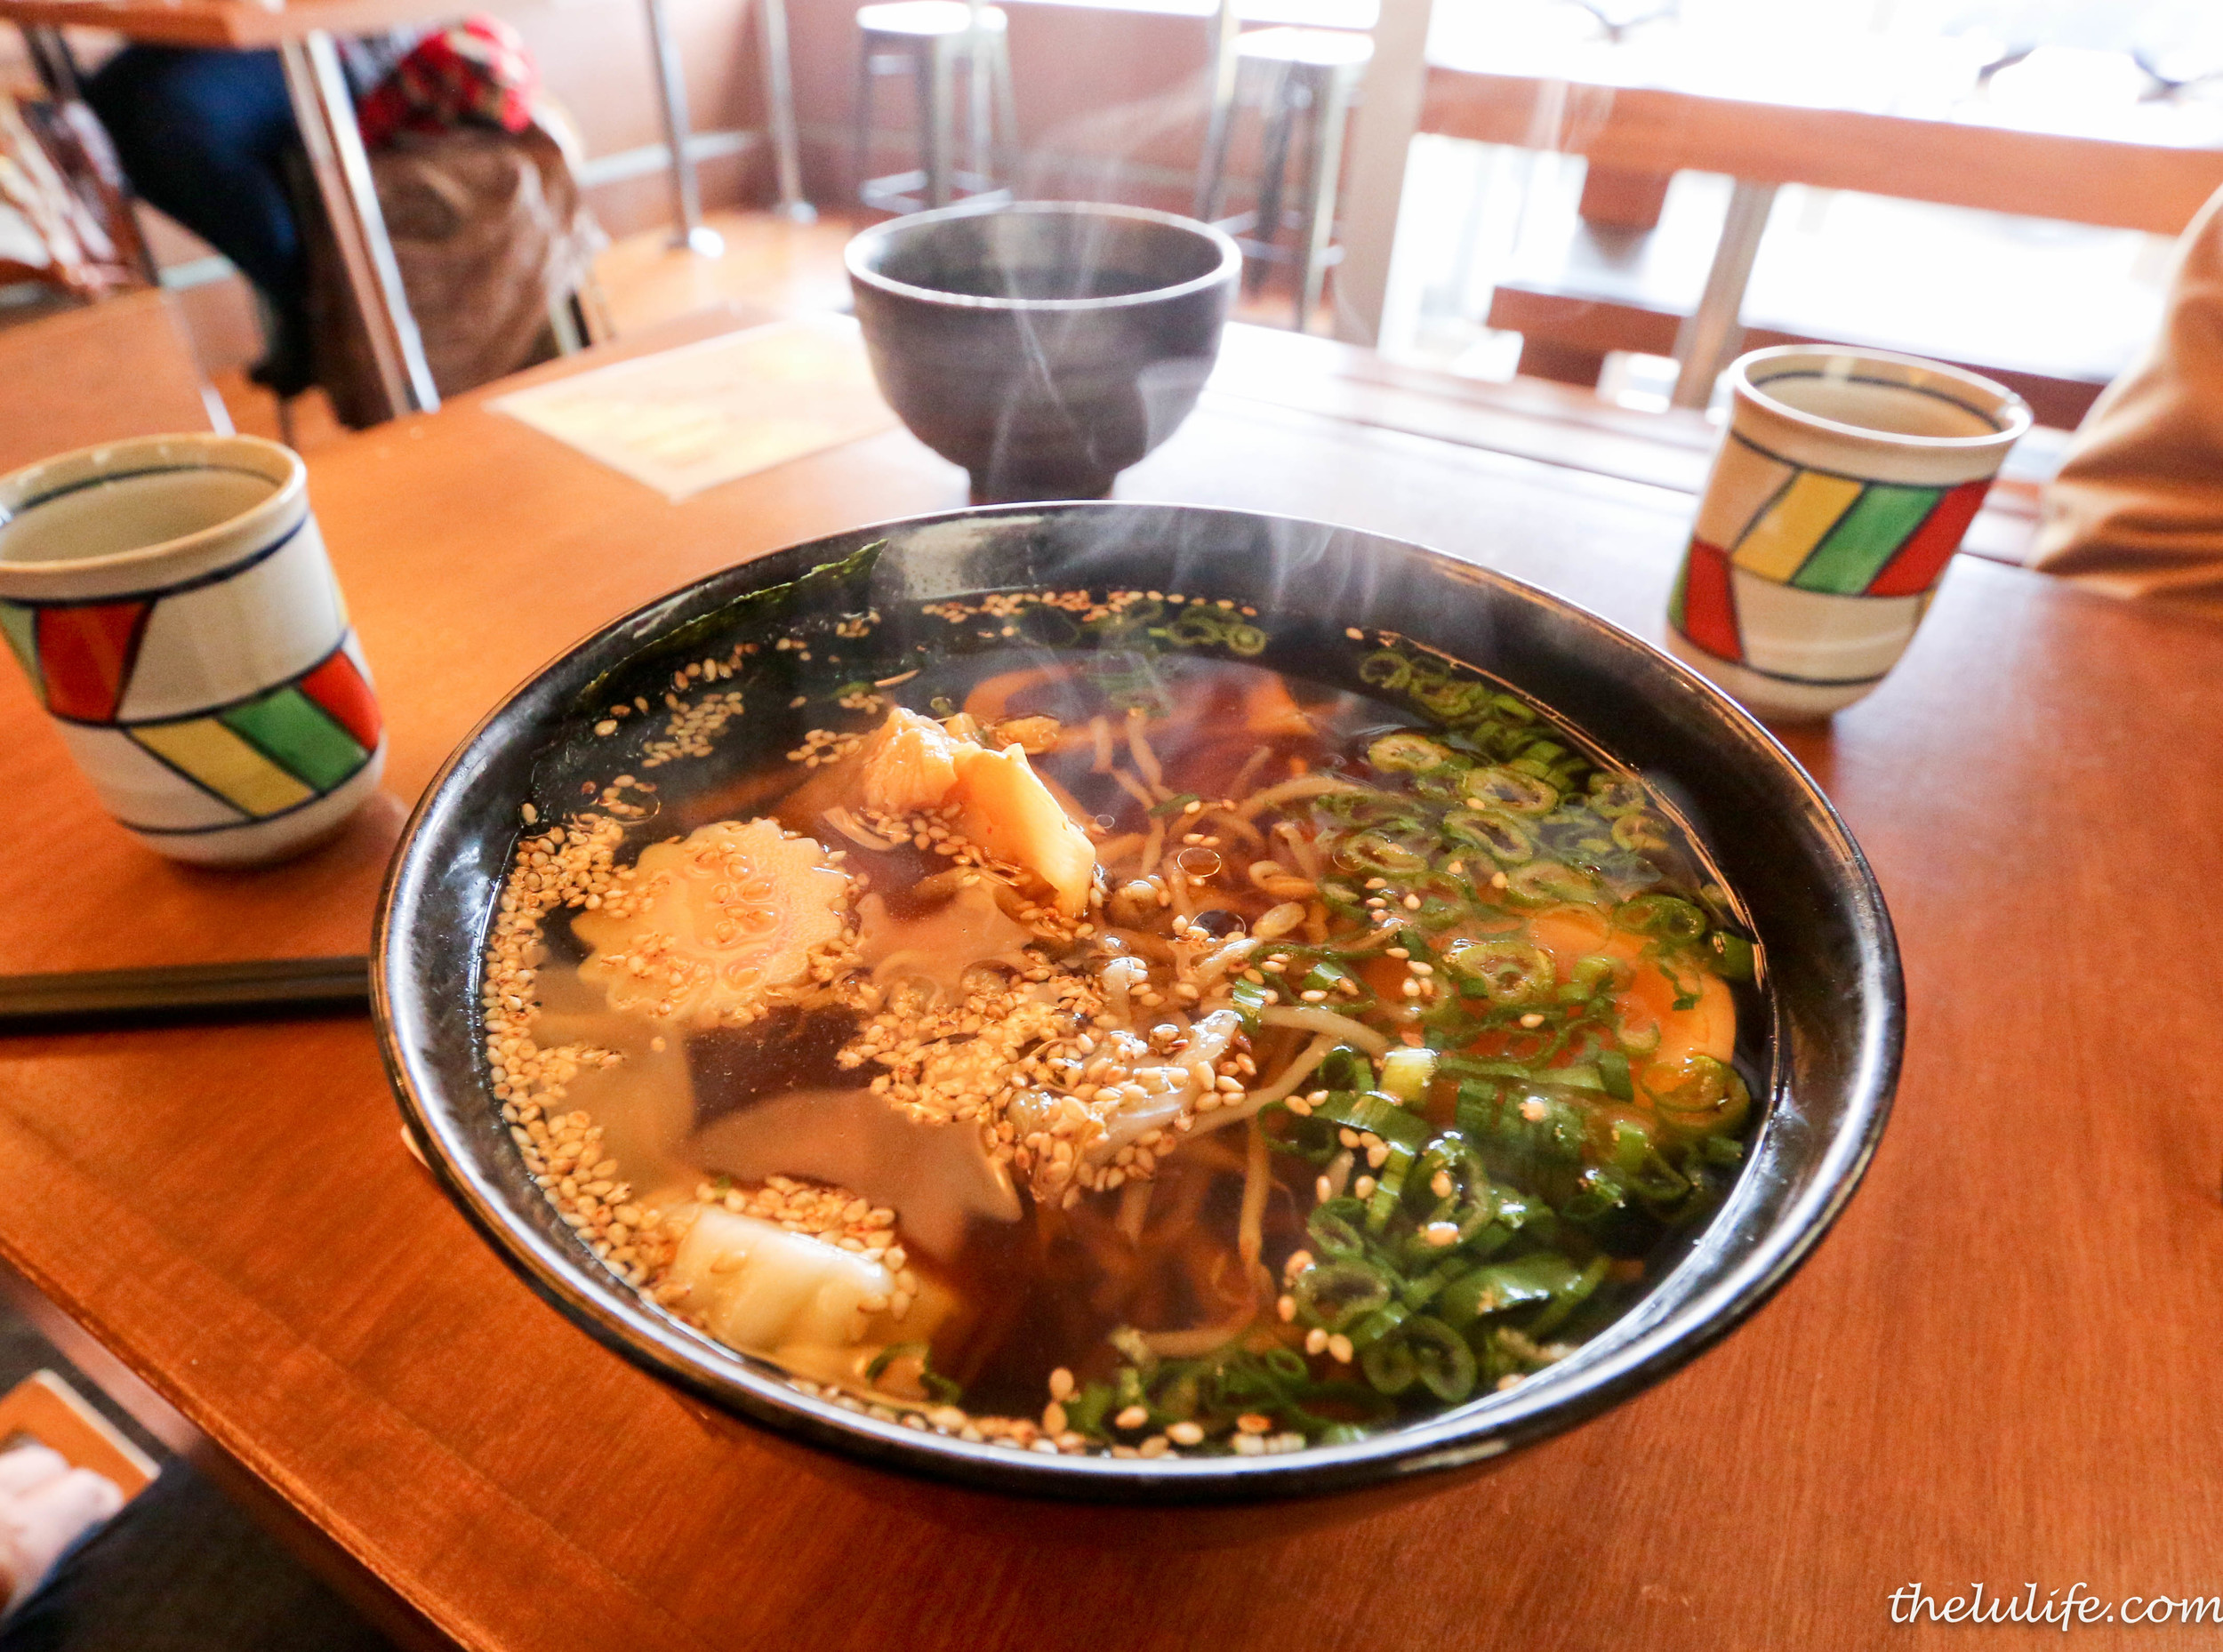 Pork loin kuro buta shoyu ramen: soy sauce and bonito fish broth with menma, scallion, nori, bean sprout, wasabi oil and boiled egg